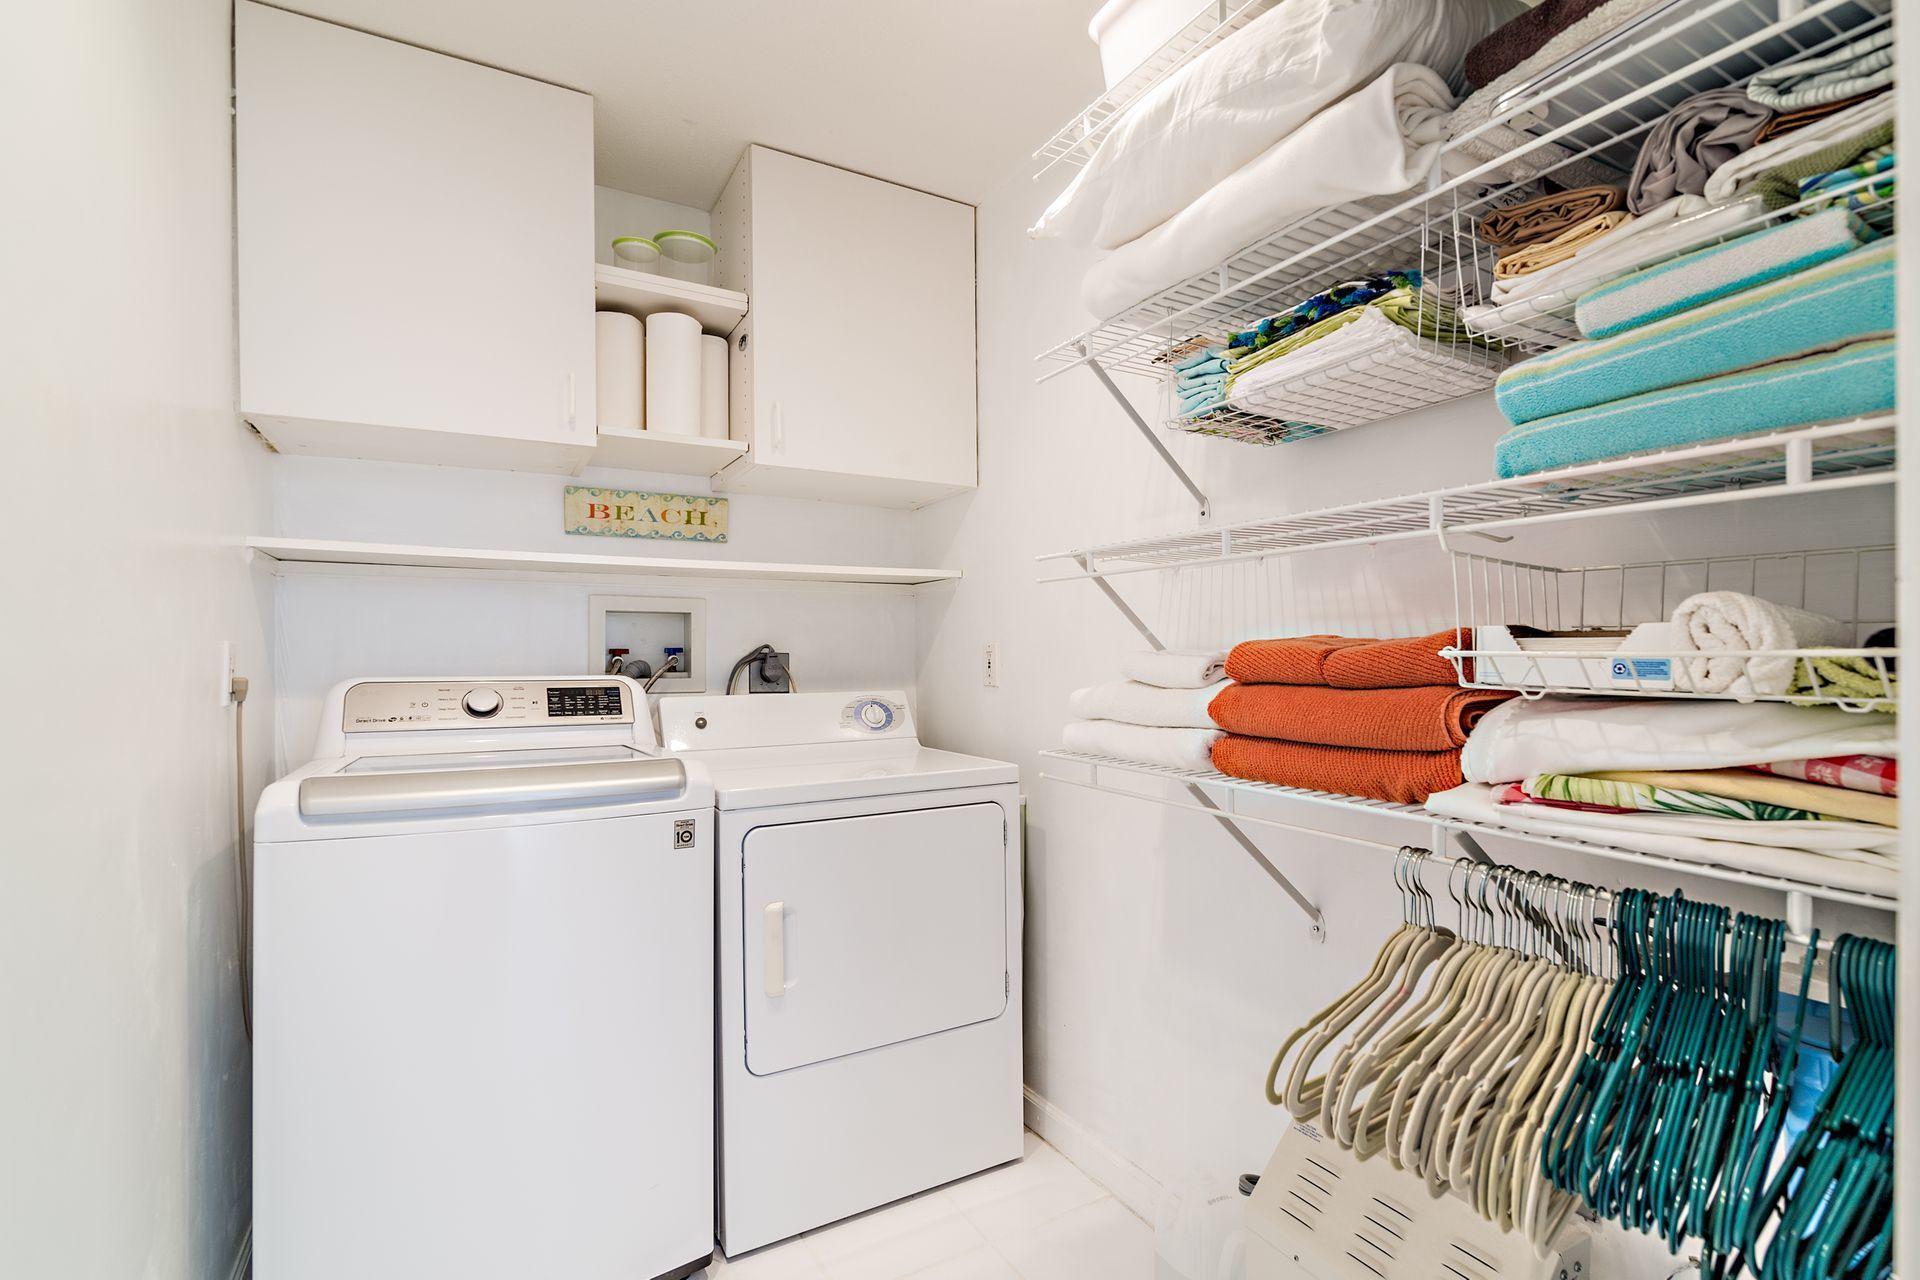 8G Laundry Room